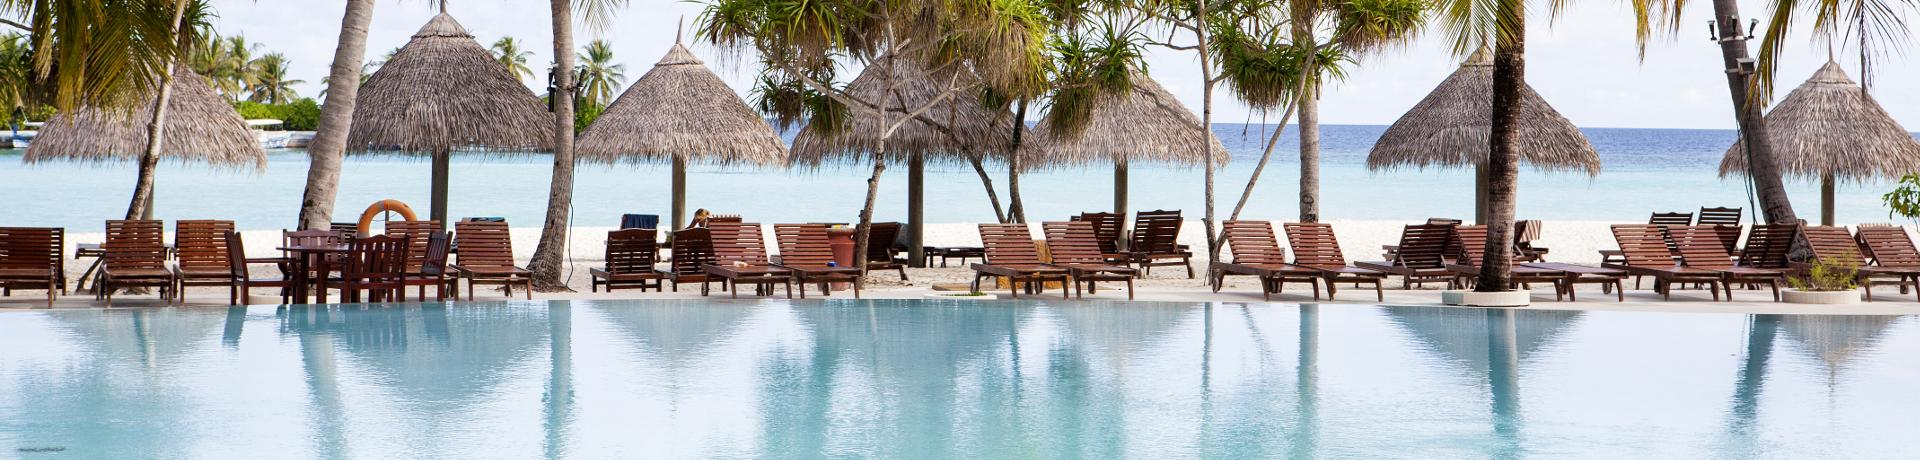 Karibik: Hotel - Pool II - Emotion